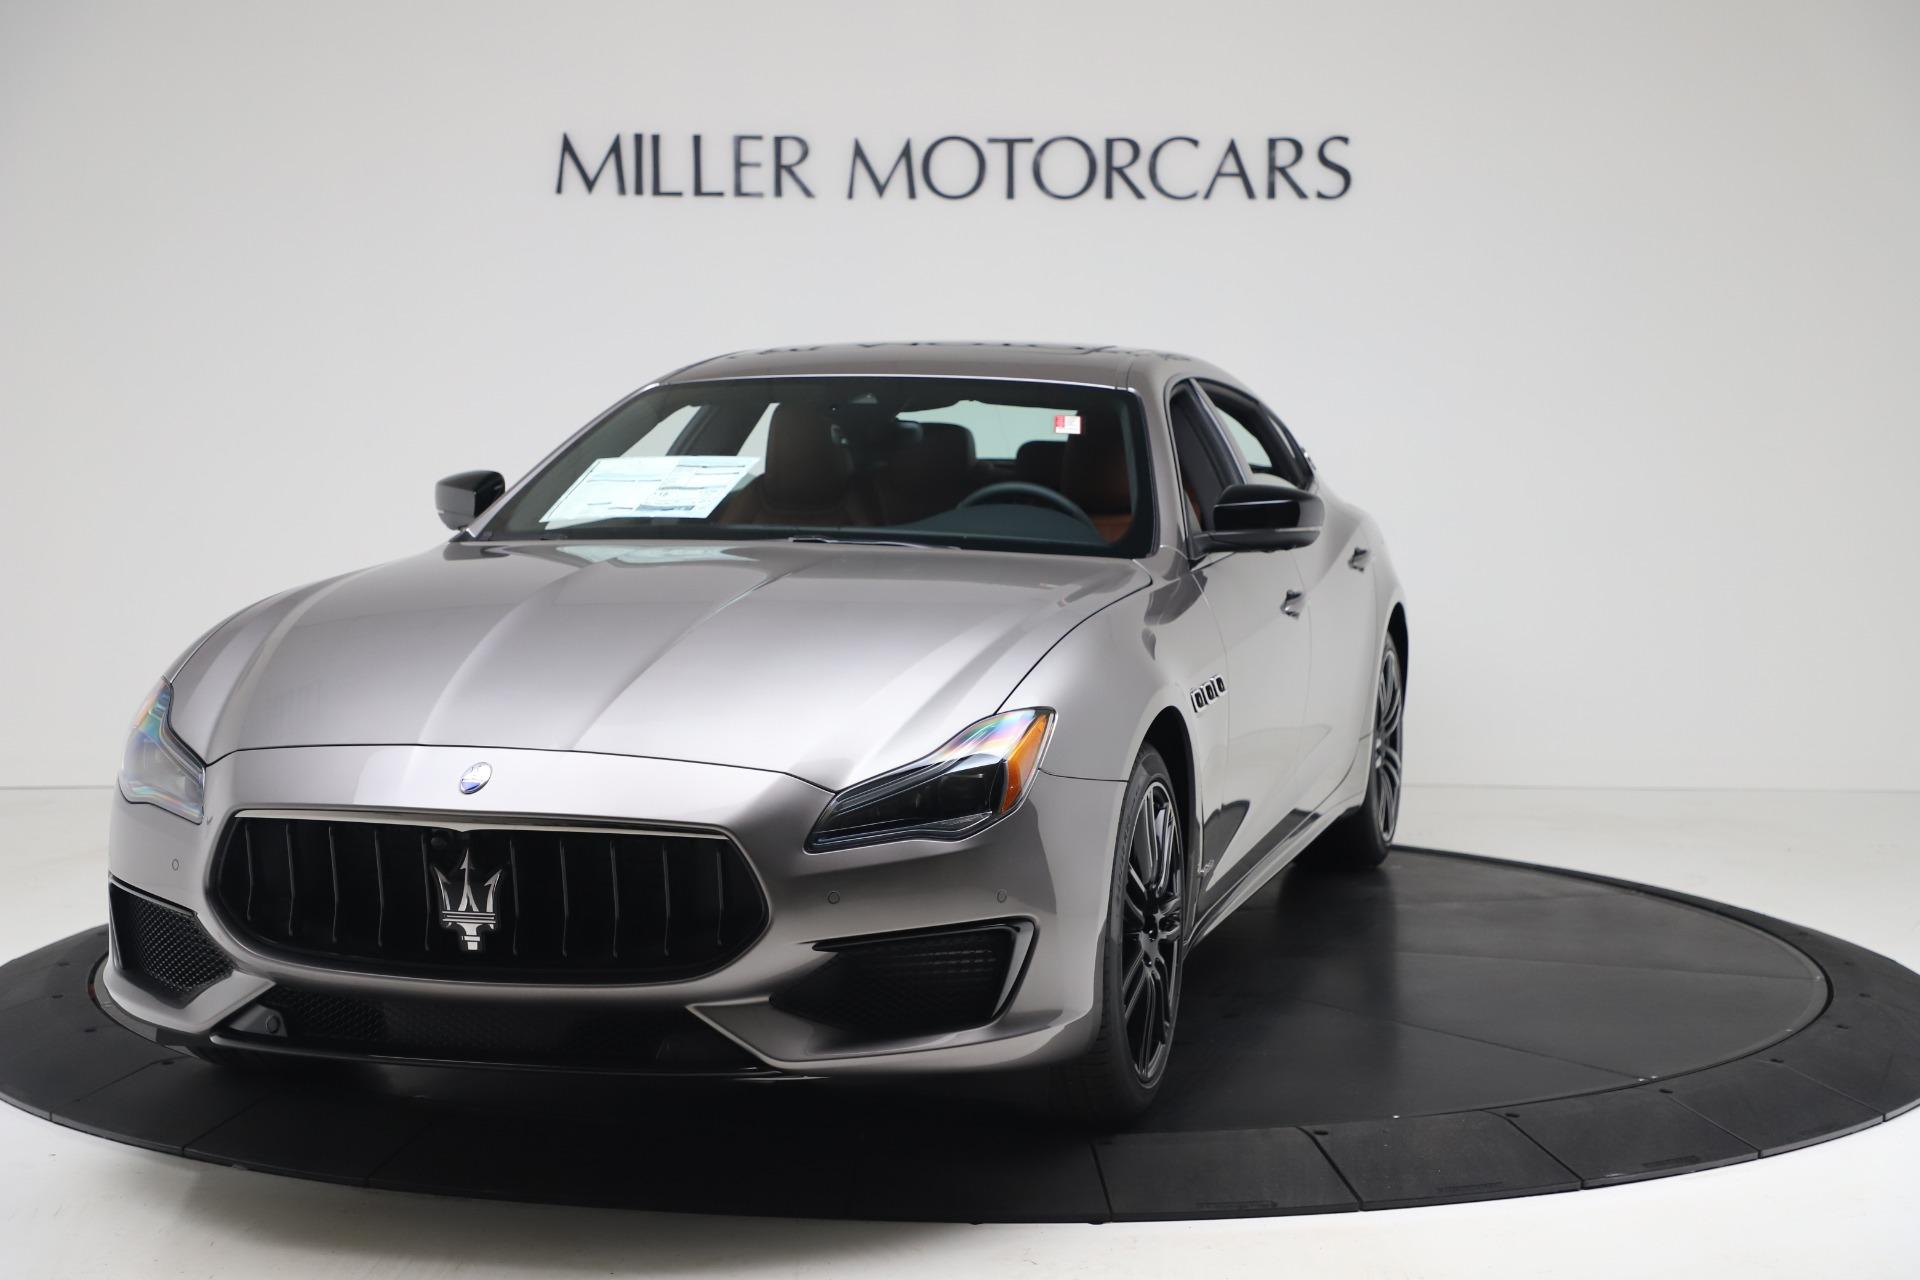 New 2020 Maserati Quattroporte S Q4 GranSport for sale $120,285 at McLaren Greenwich in Greenwich CT 06830 1